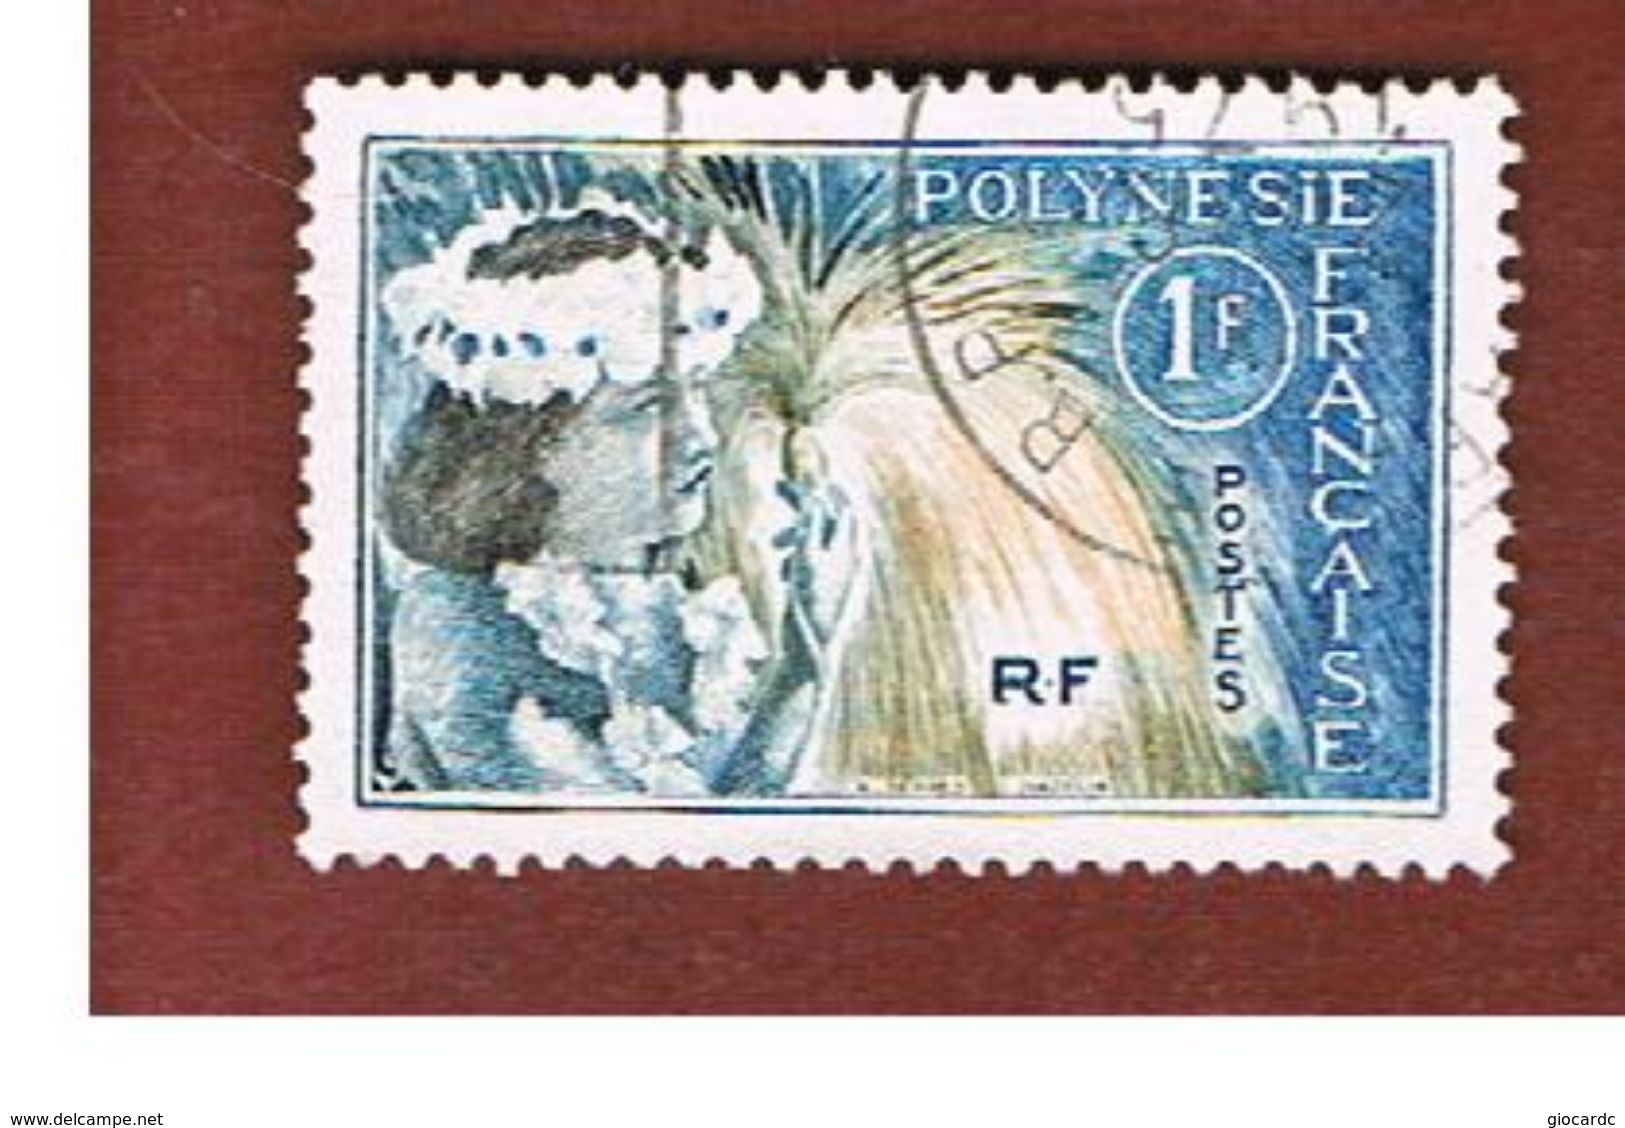 POLINESIA FRANCESE  (FRENCH POLYNESIA ) - SG 33  - 1964 TAHITIAN DANCER - USED° - Usati